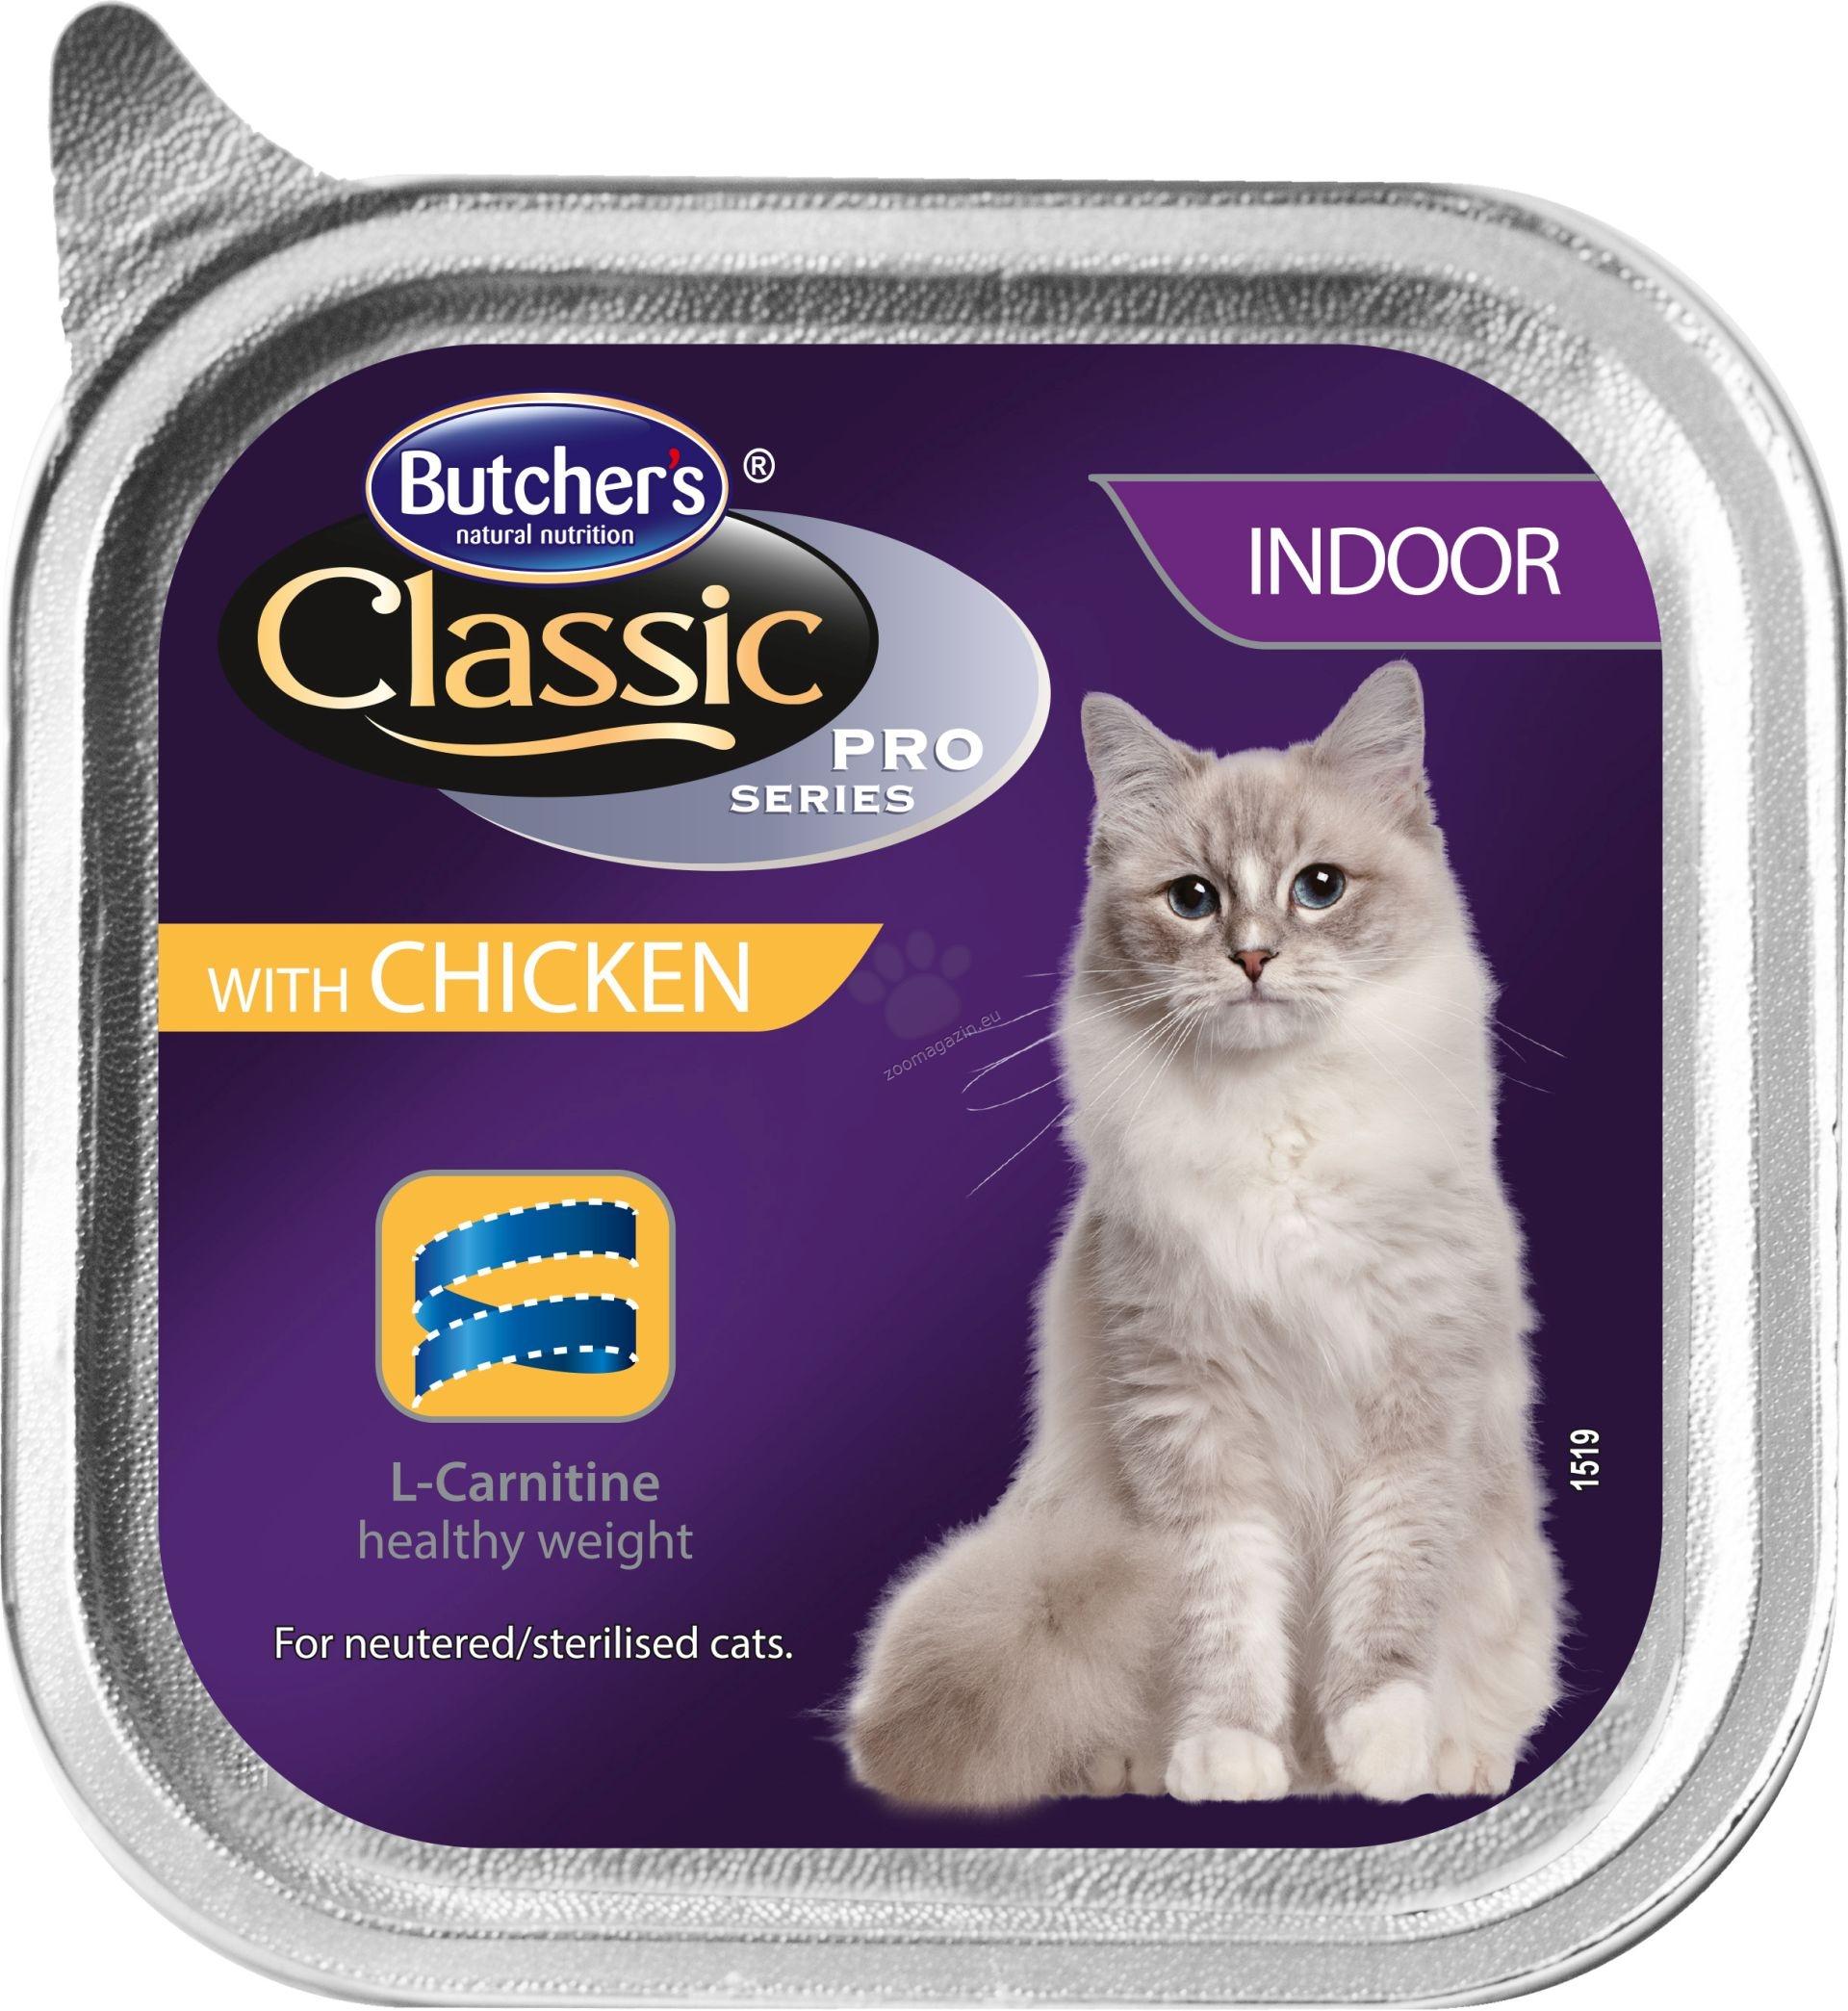 Butchers - Classic Pro Series Indoor with chicken pate - храна за котки, отглеждани на закрито, с пилешко месо, 100 гр. /пастет/